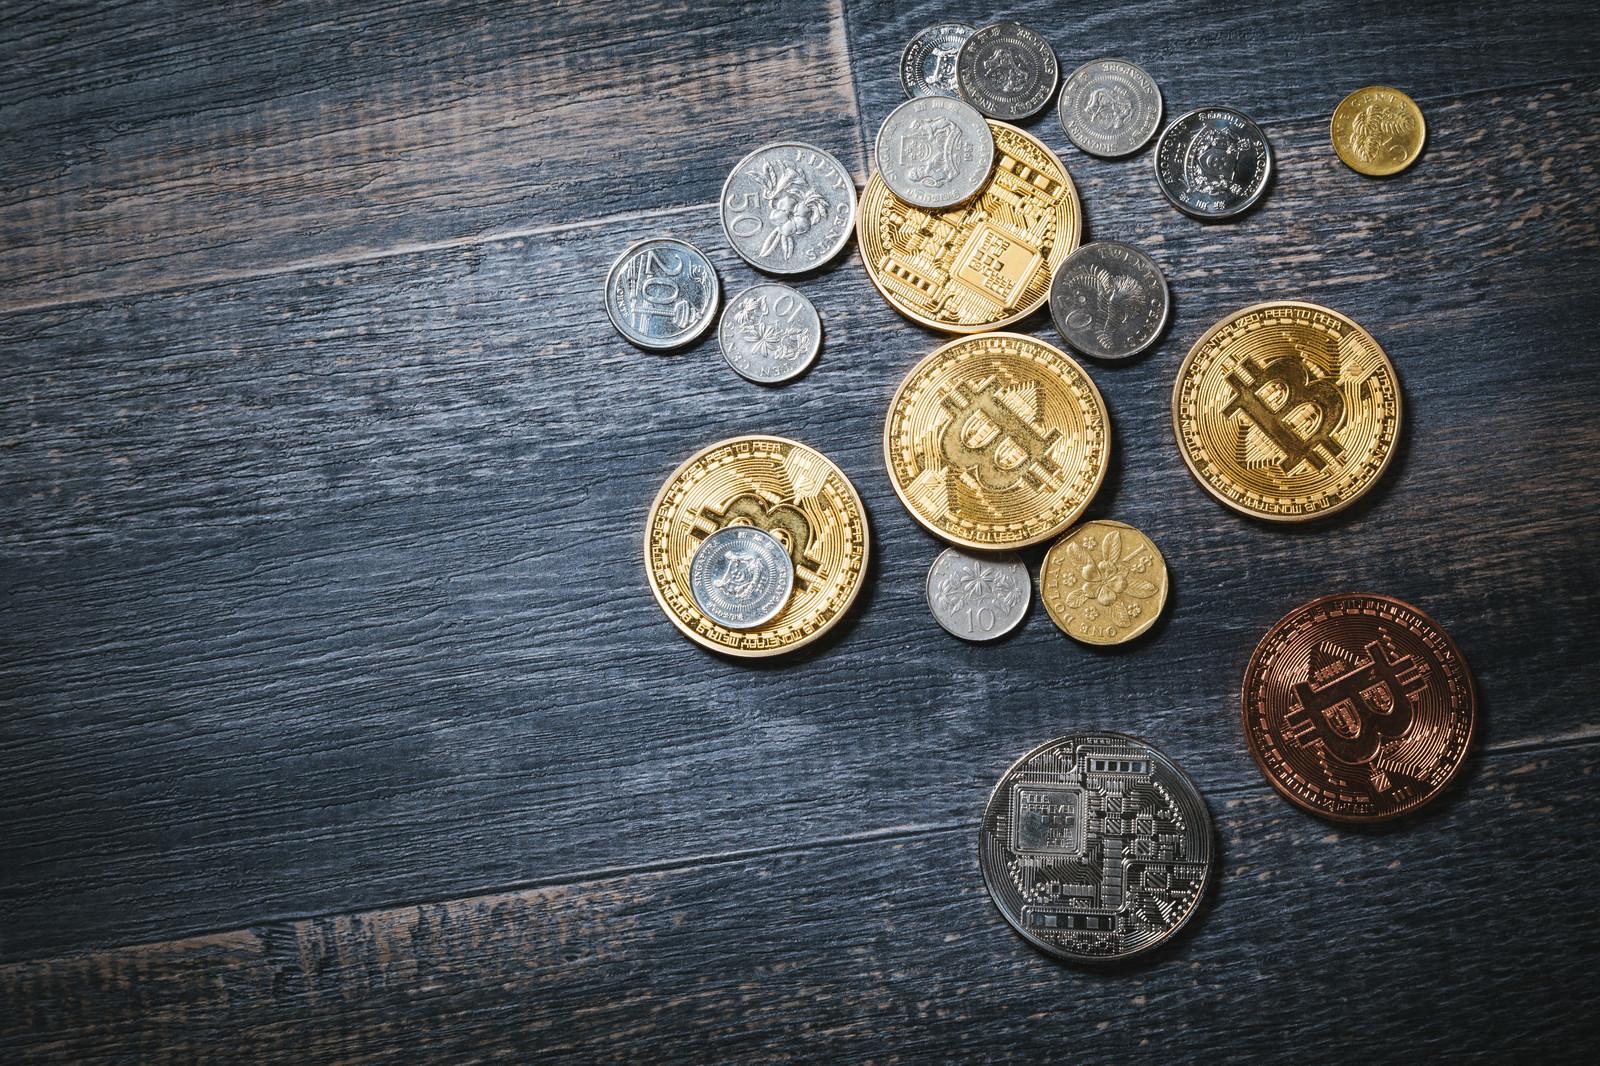 平成31年度7月末の金融資産公開